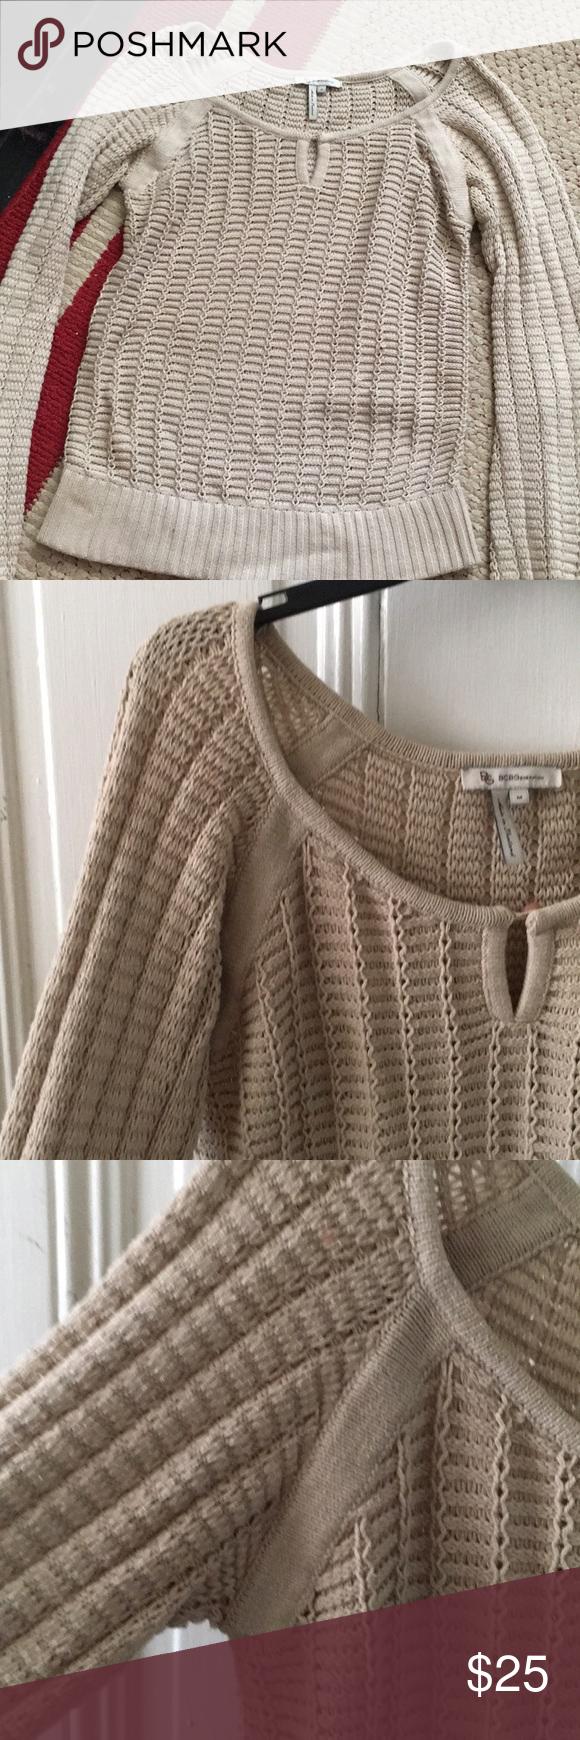 a0bf440a0 BCBG comfy sweater